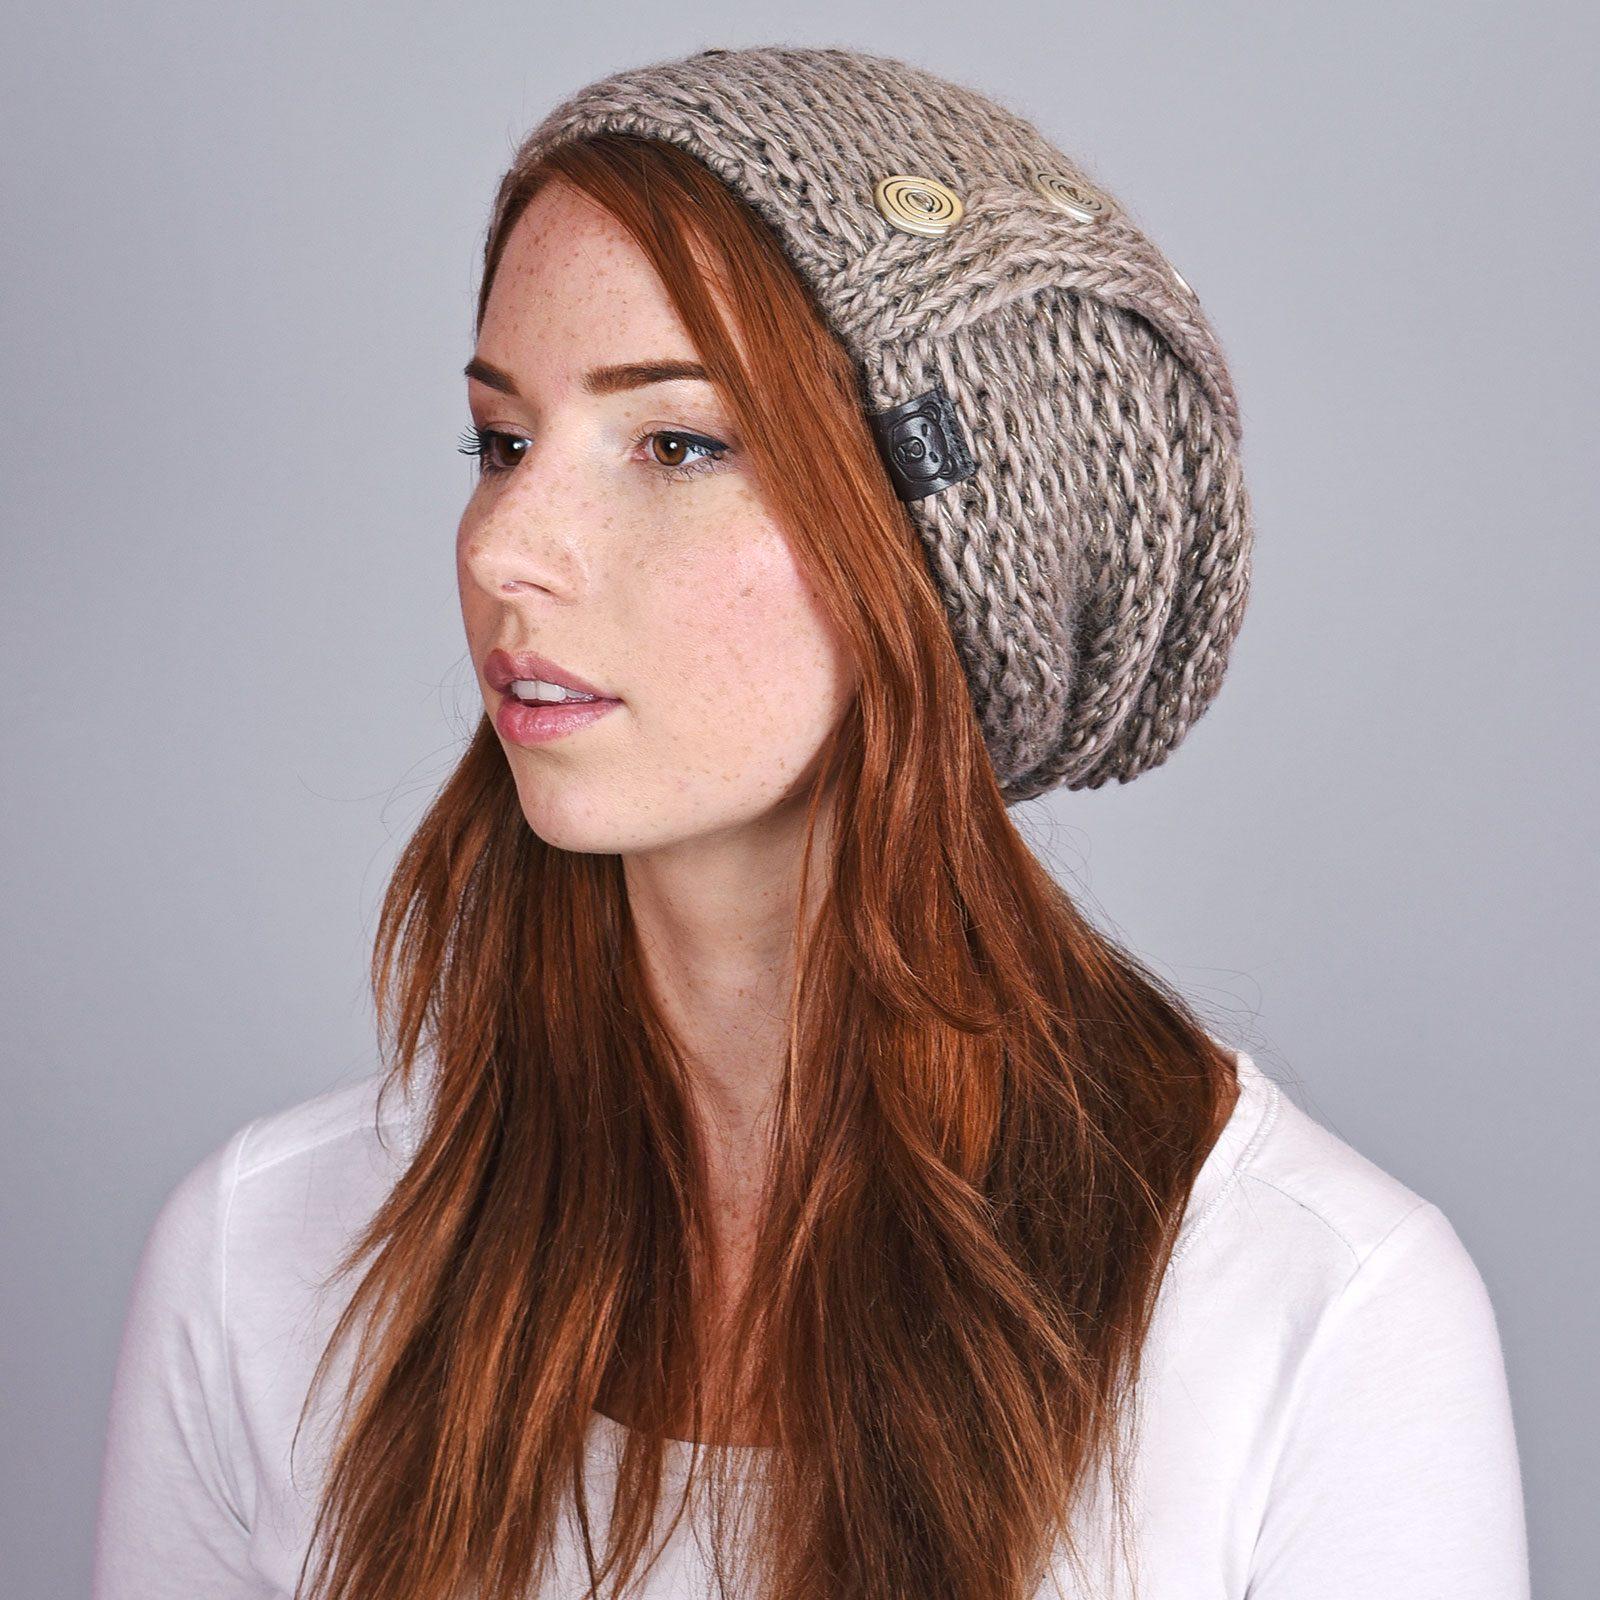 http://lookbook.allee-du-foulard.fr/wp-content/uploads/2018/12/CP-01067-VF16-1-bonnet-femme-long-taupe-1600x1600.jpg